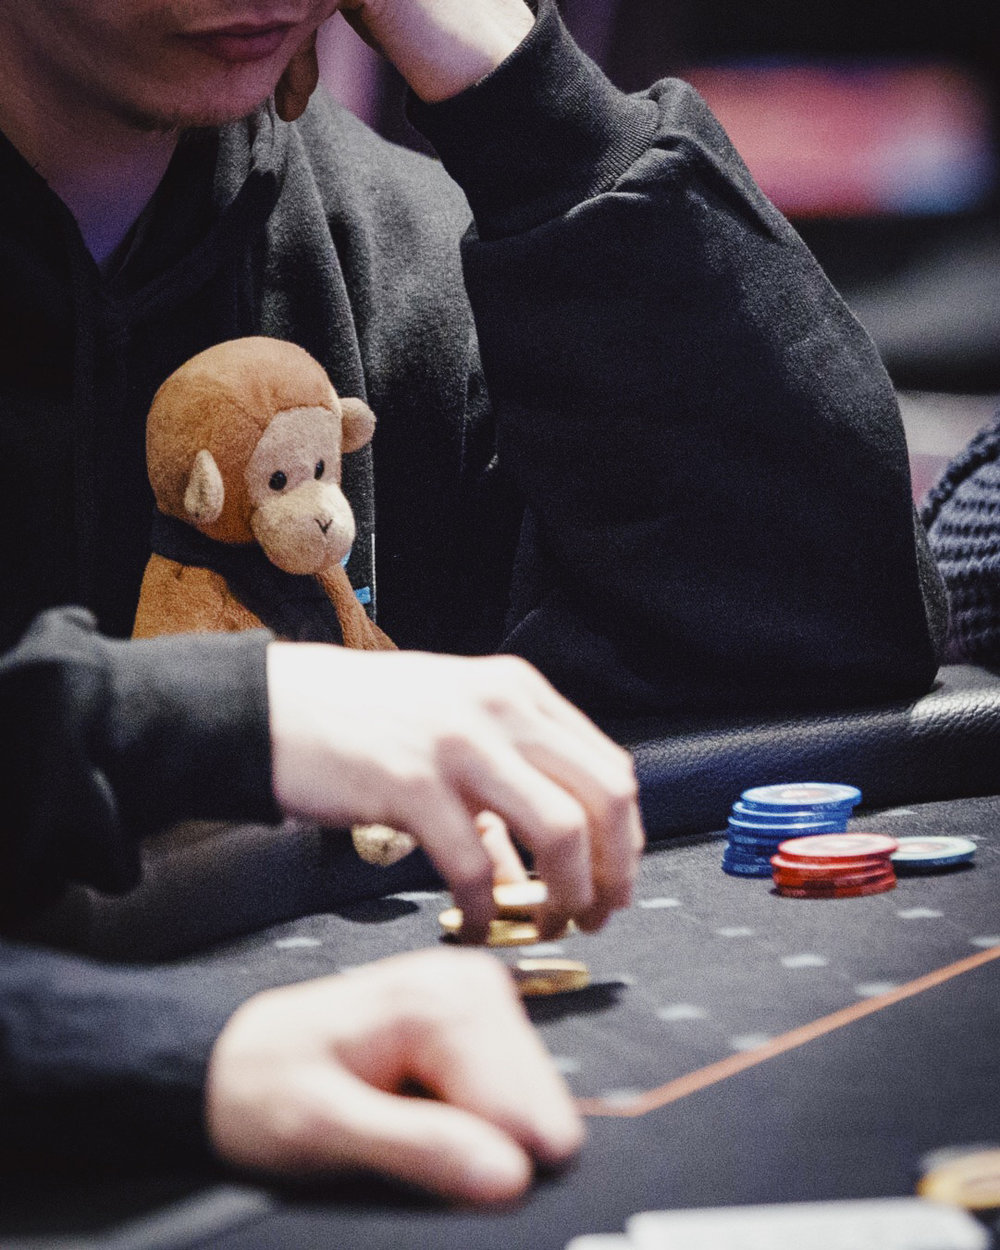 polina-shubkina-poker-010.JPG